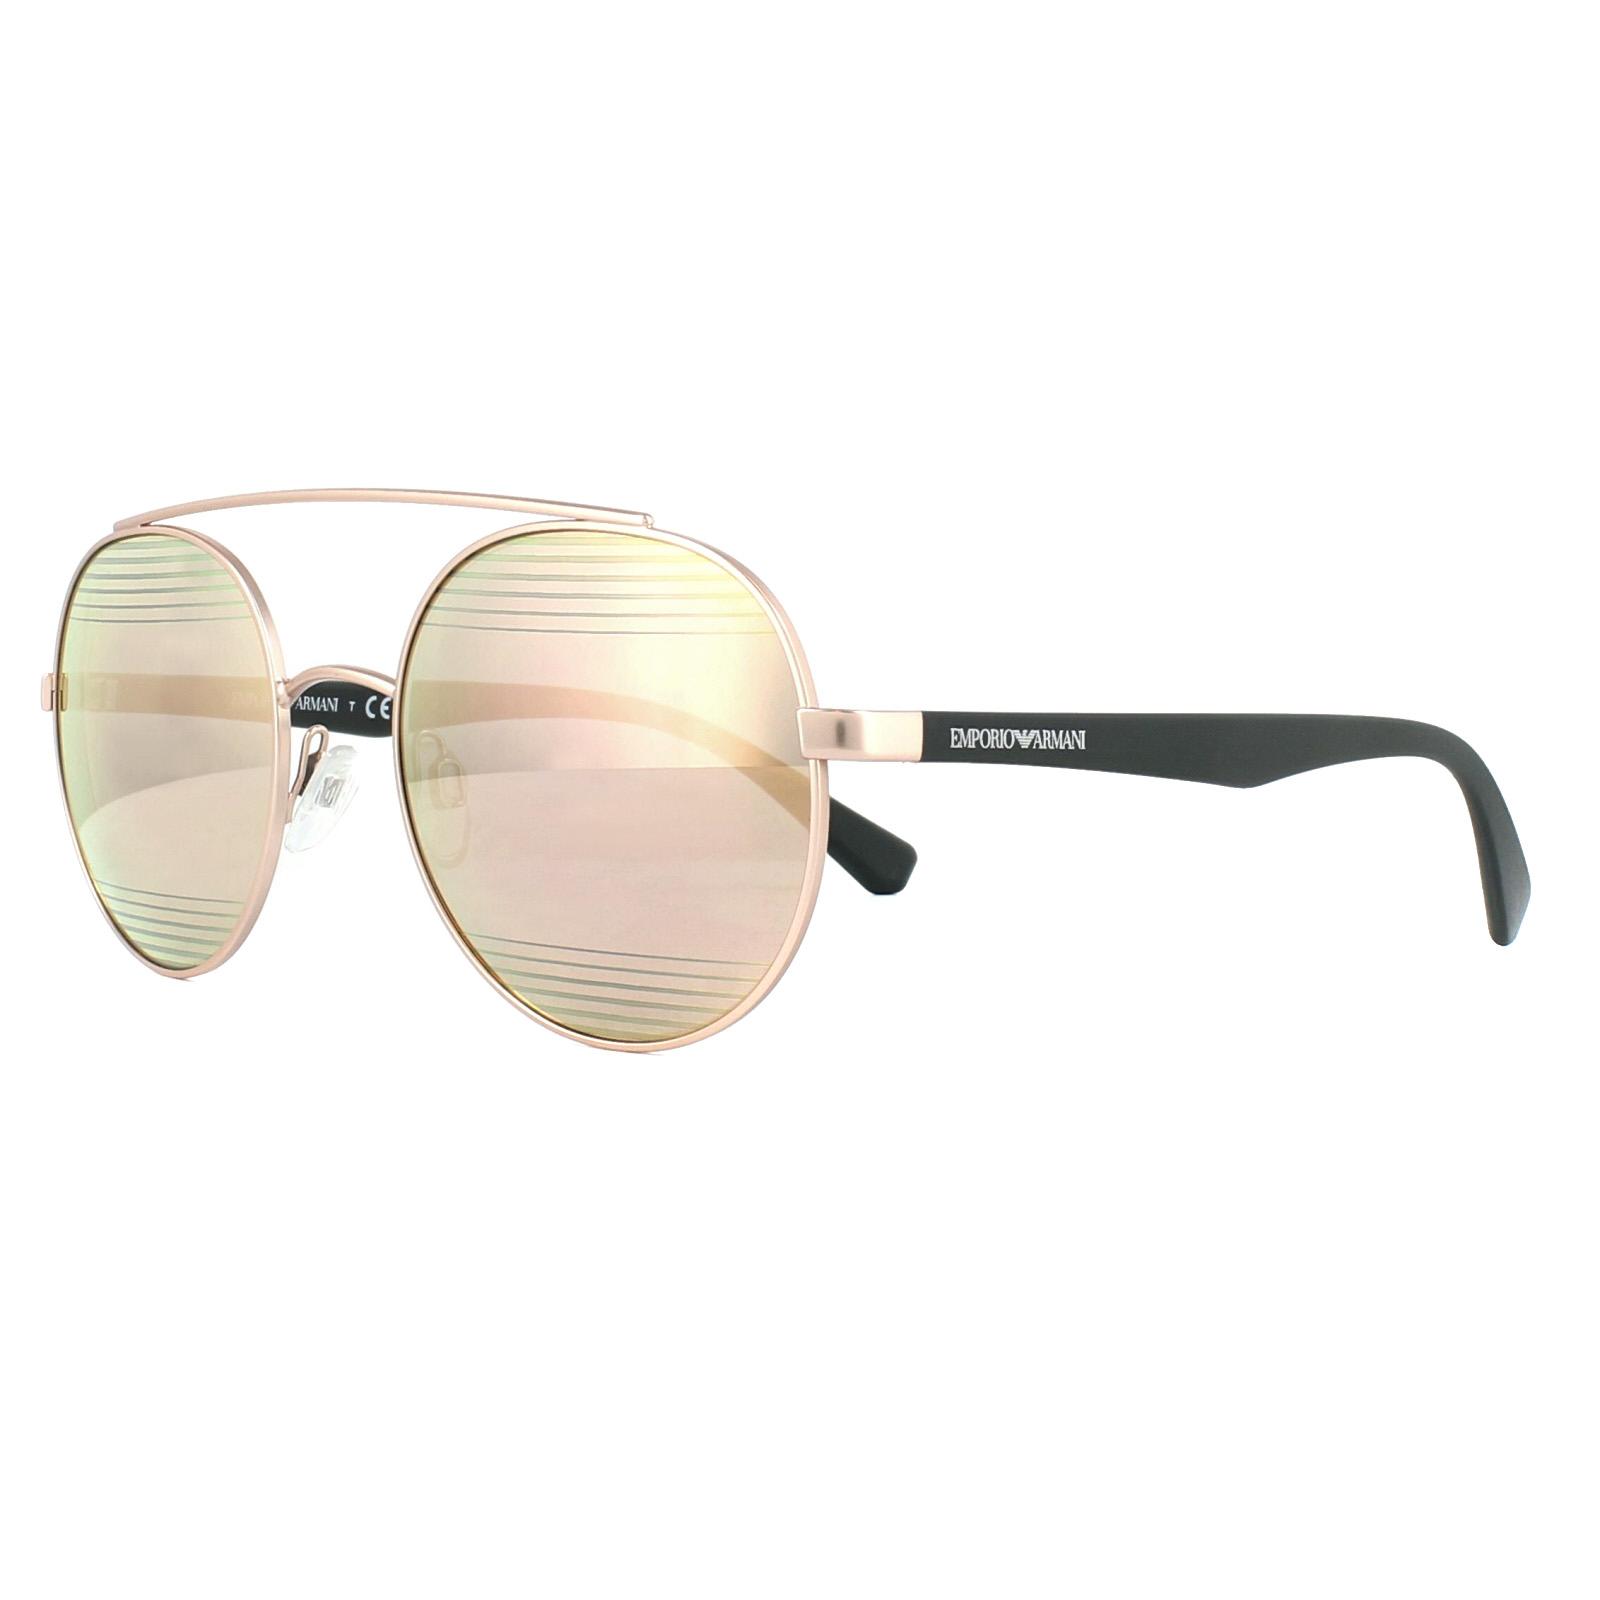 aa105c3c852 Sentinel Emporio Armani Sunglasses 2051 31674Z Matt Rose Gold Rose Gold  Mirror